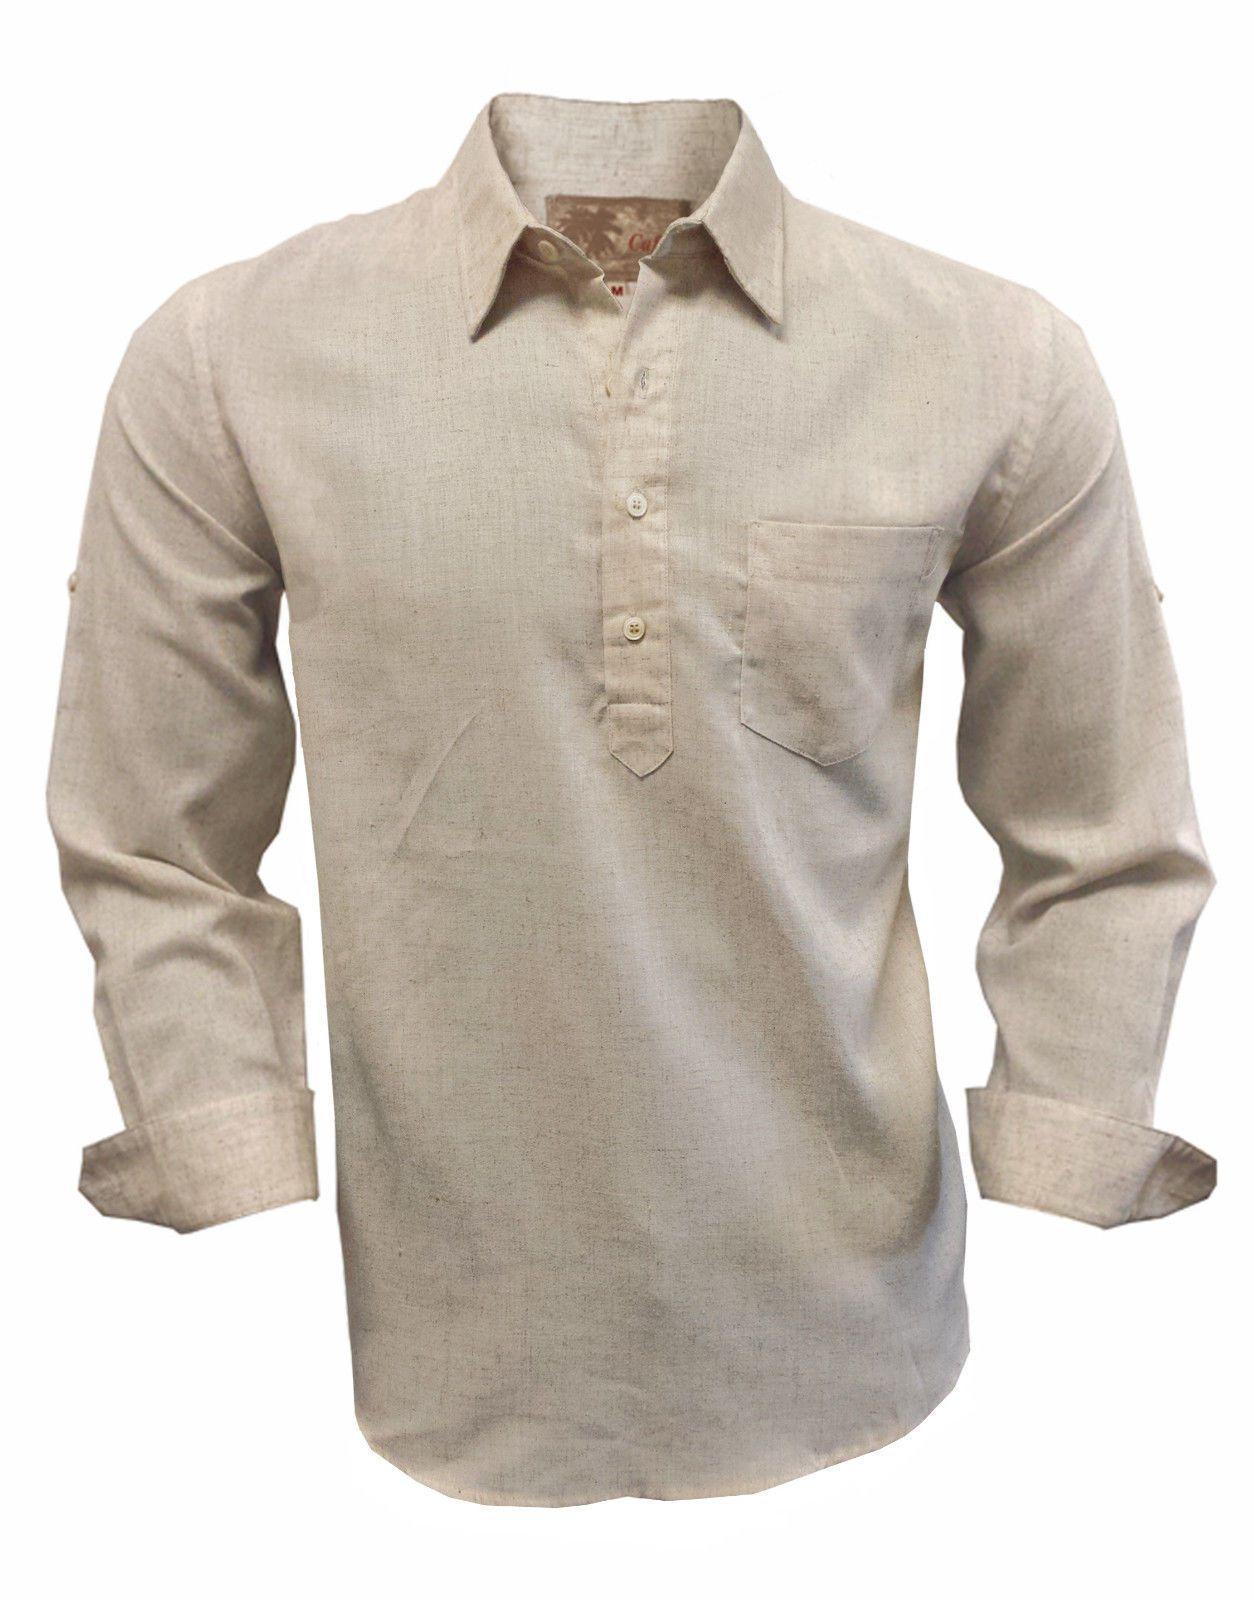 6ba962abc46 Mens Linen   Cotton High Quality Long Sleeve Half Placket Shirt ...